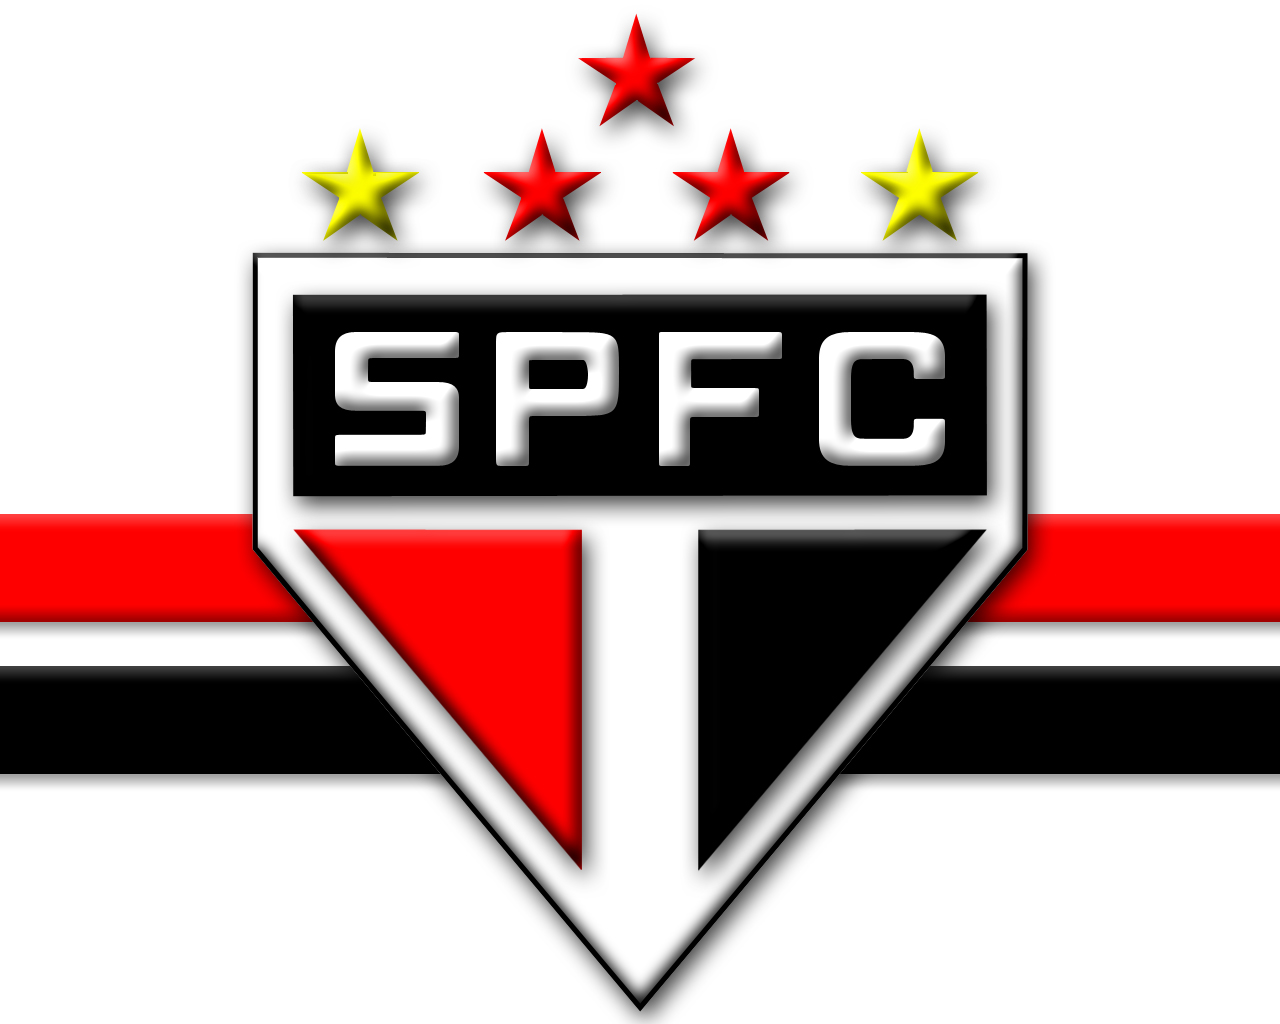 File Sao Paulo FC Wallpapers 2994X36jpg WallpapersExpertcom 1280x1024